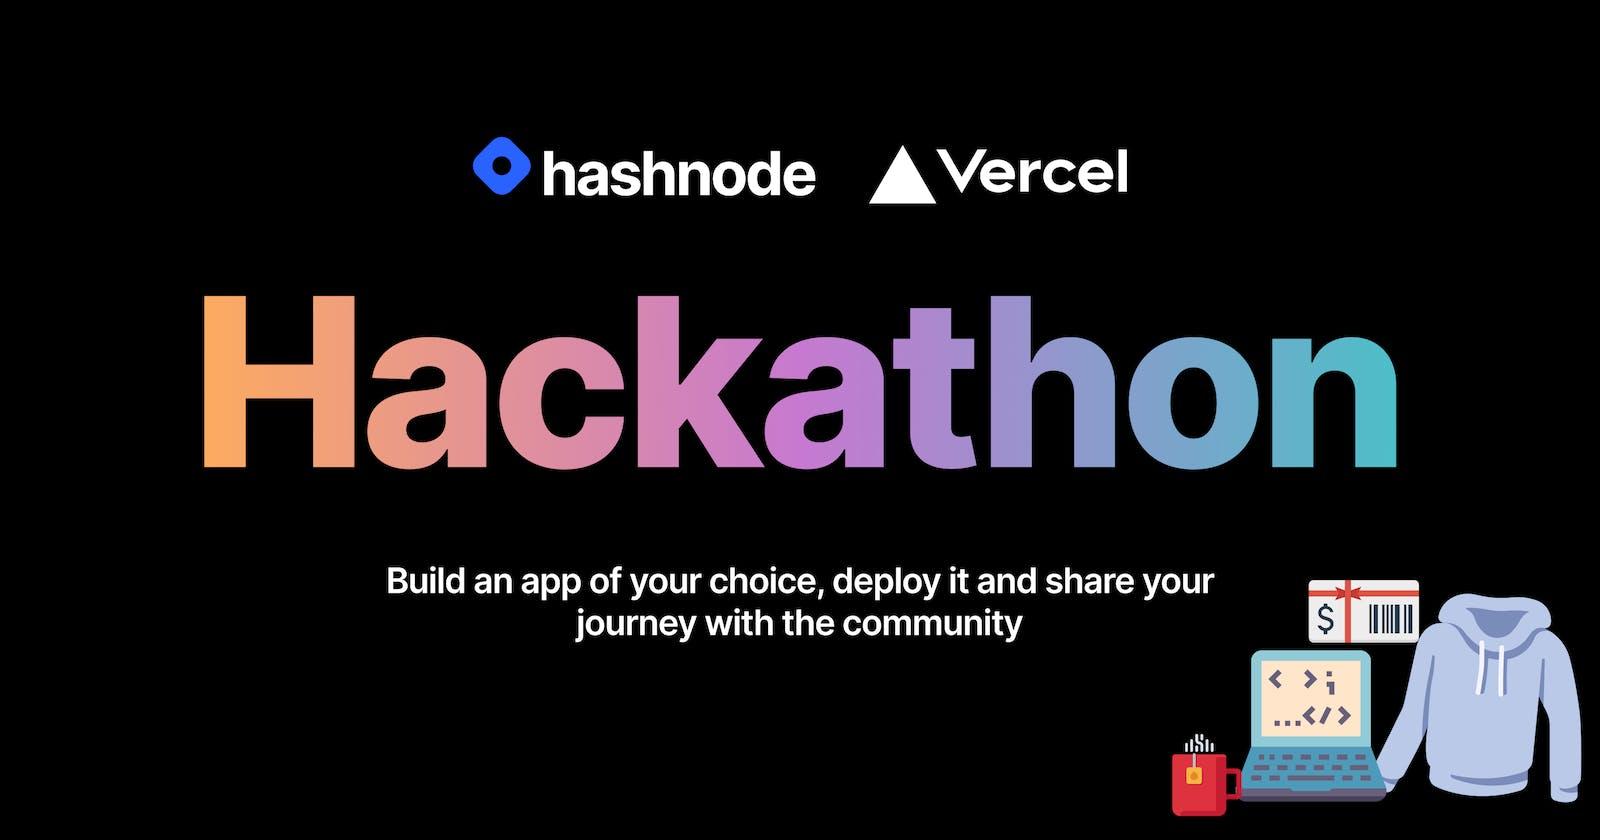 Announcing Hashnode Hackathon Powered by Vercel!